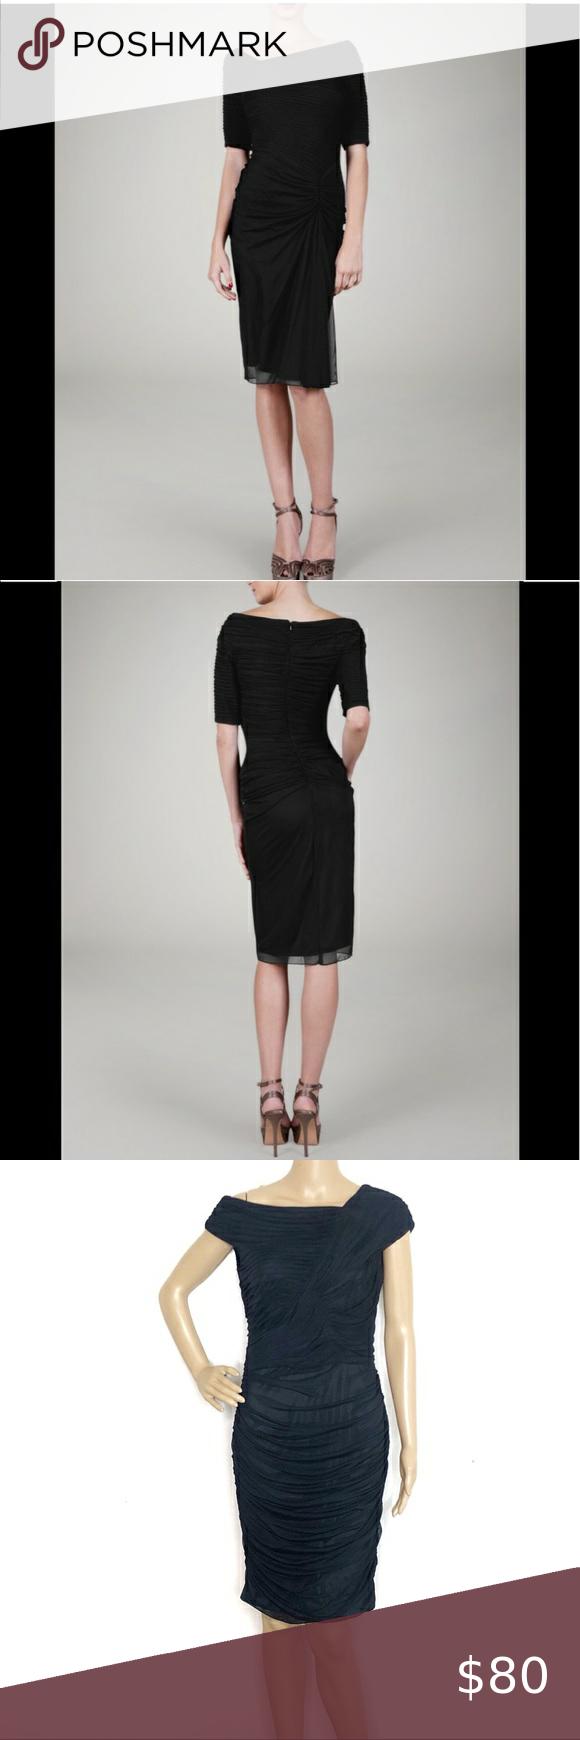 Tadashi Shoji Black Draped Ruched Black Dress Black Ruched Dress Off Shoulder Casual Dress Black Lace Cocktail Dress [ 1740 x 580 Pixel ]